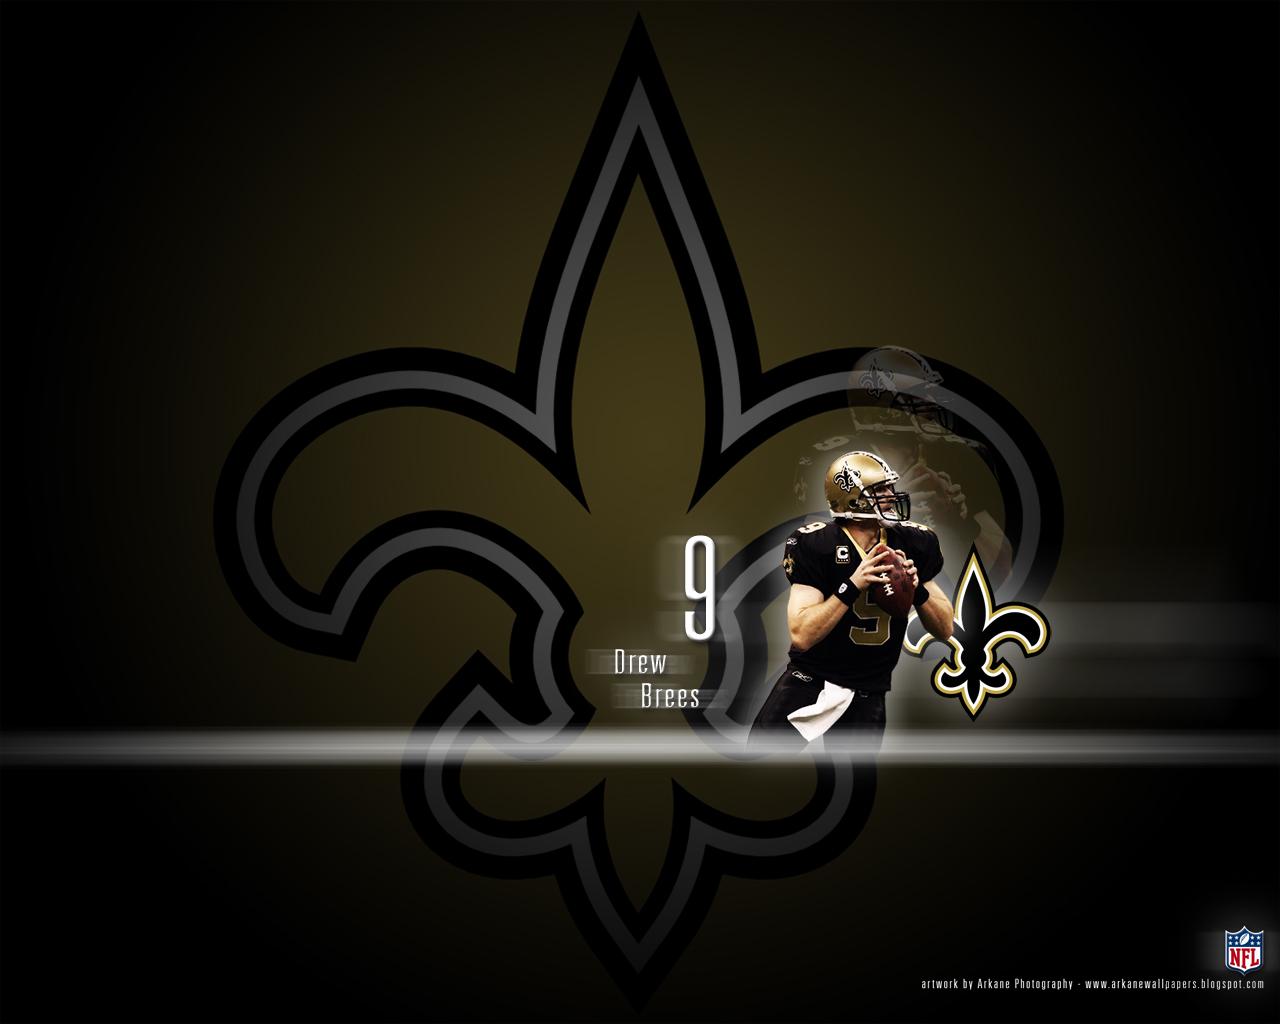 Arkane Nfl Wallpapers Drew Brees New Orleans Saints